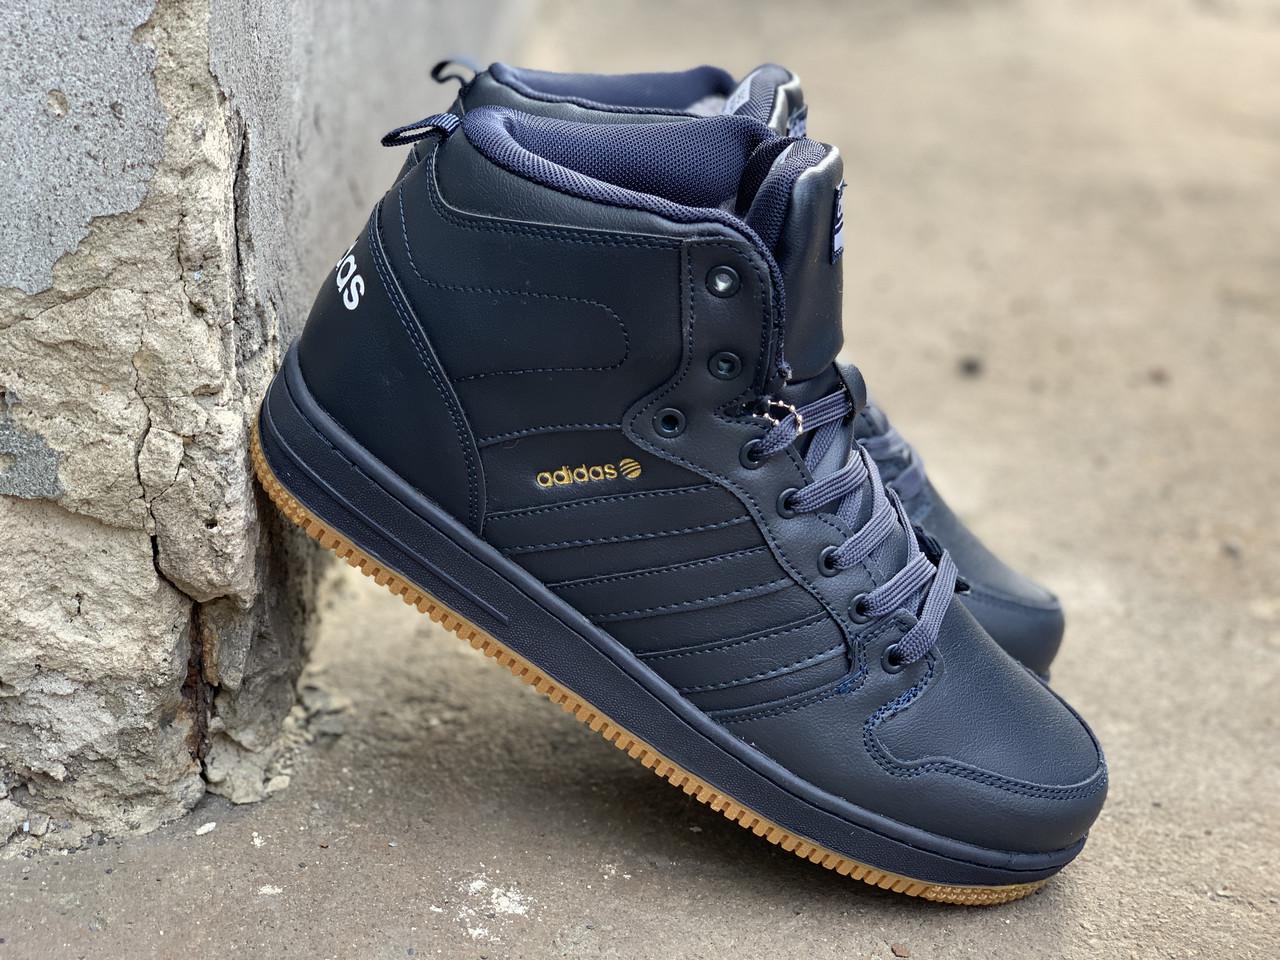 Зимние ботинки (на меху) мужские Adidas Cloudfoam (реплика) 3-046 ⏩ [ 44,44,45 ]